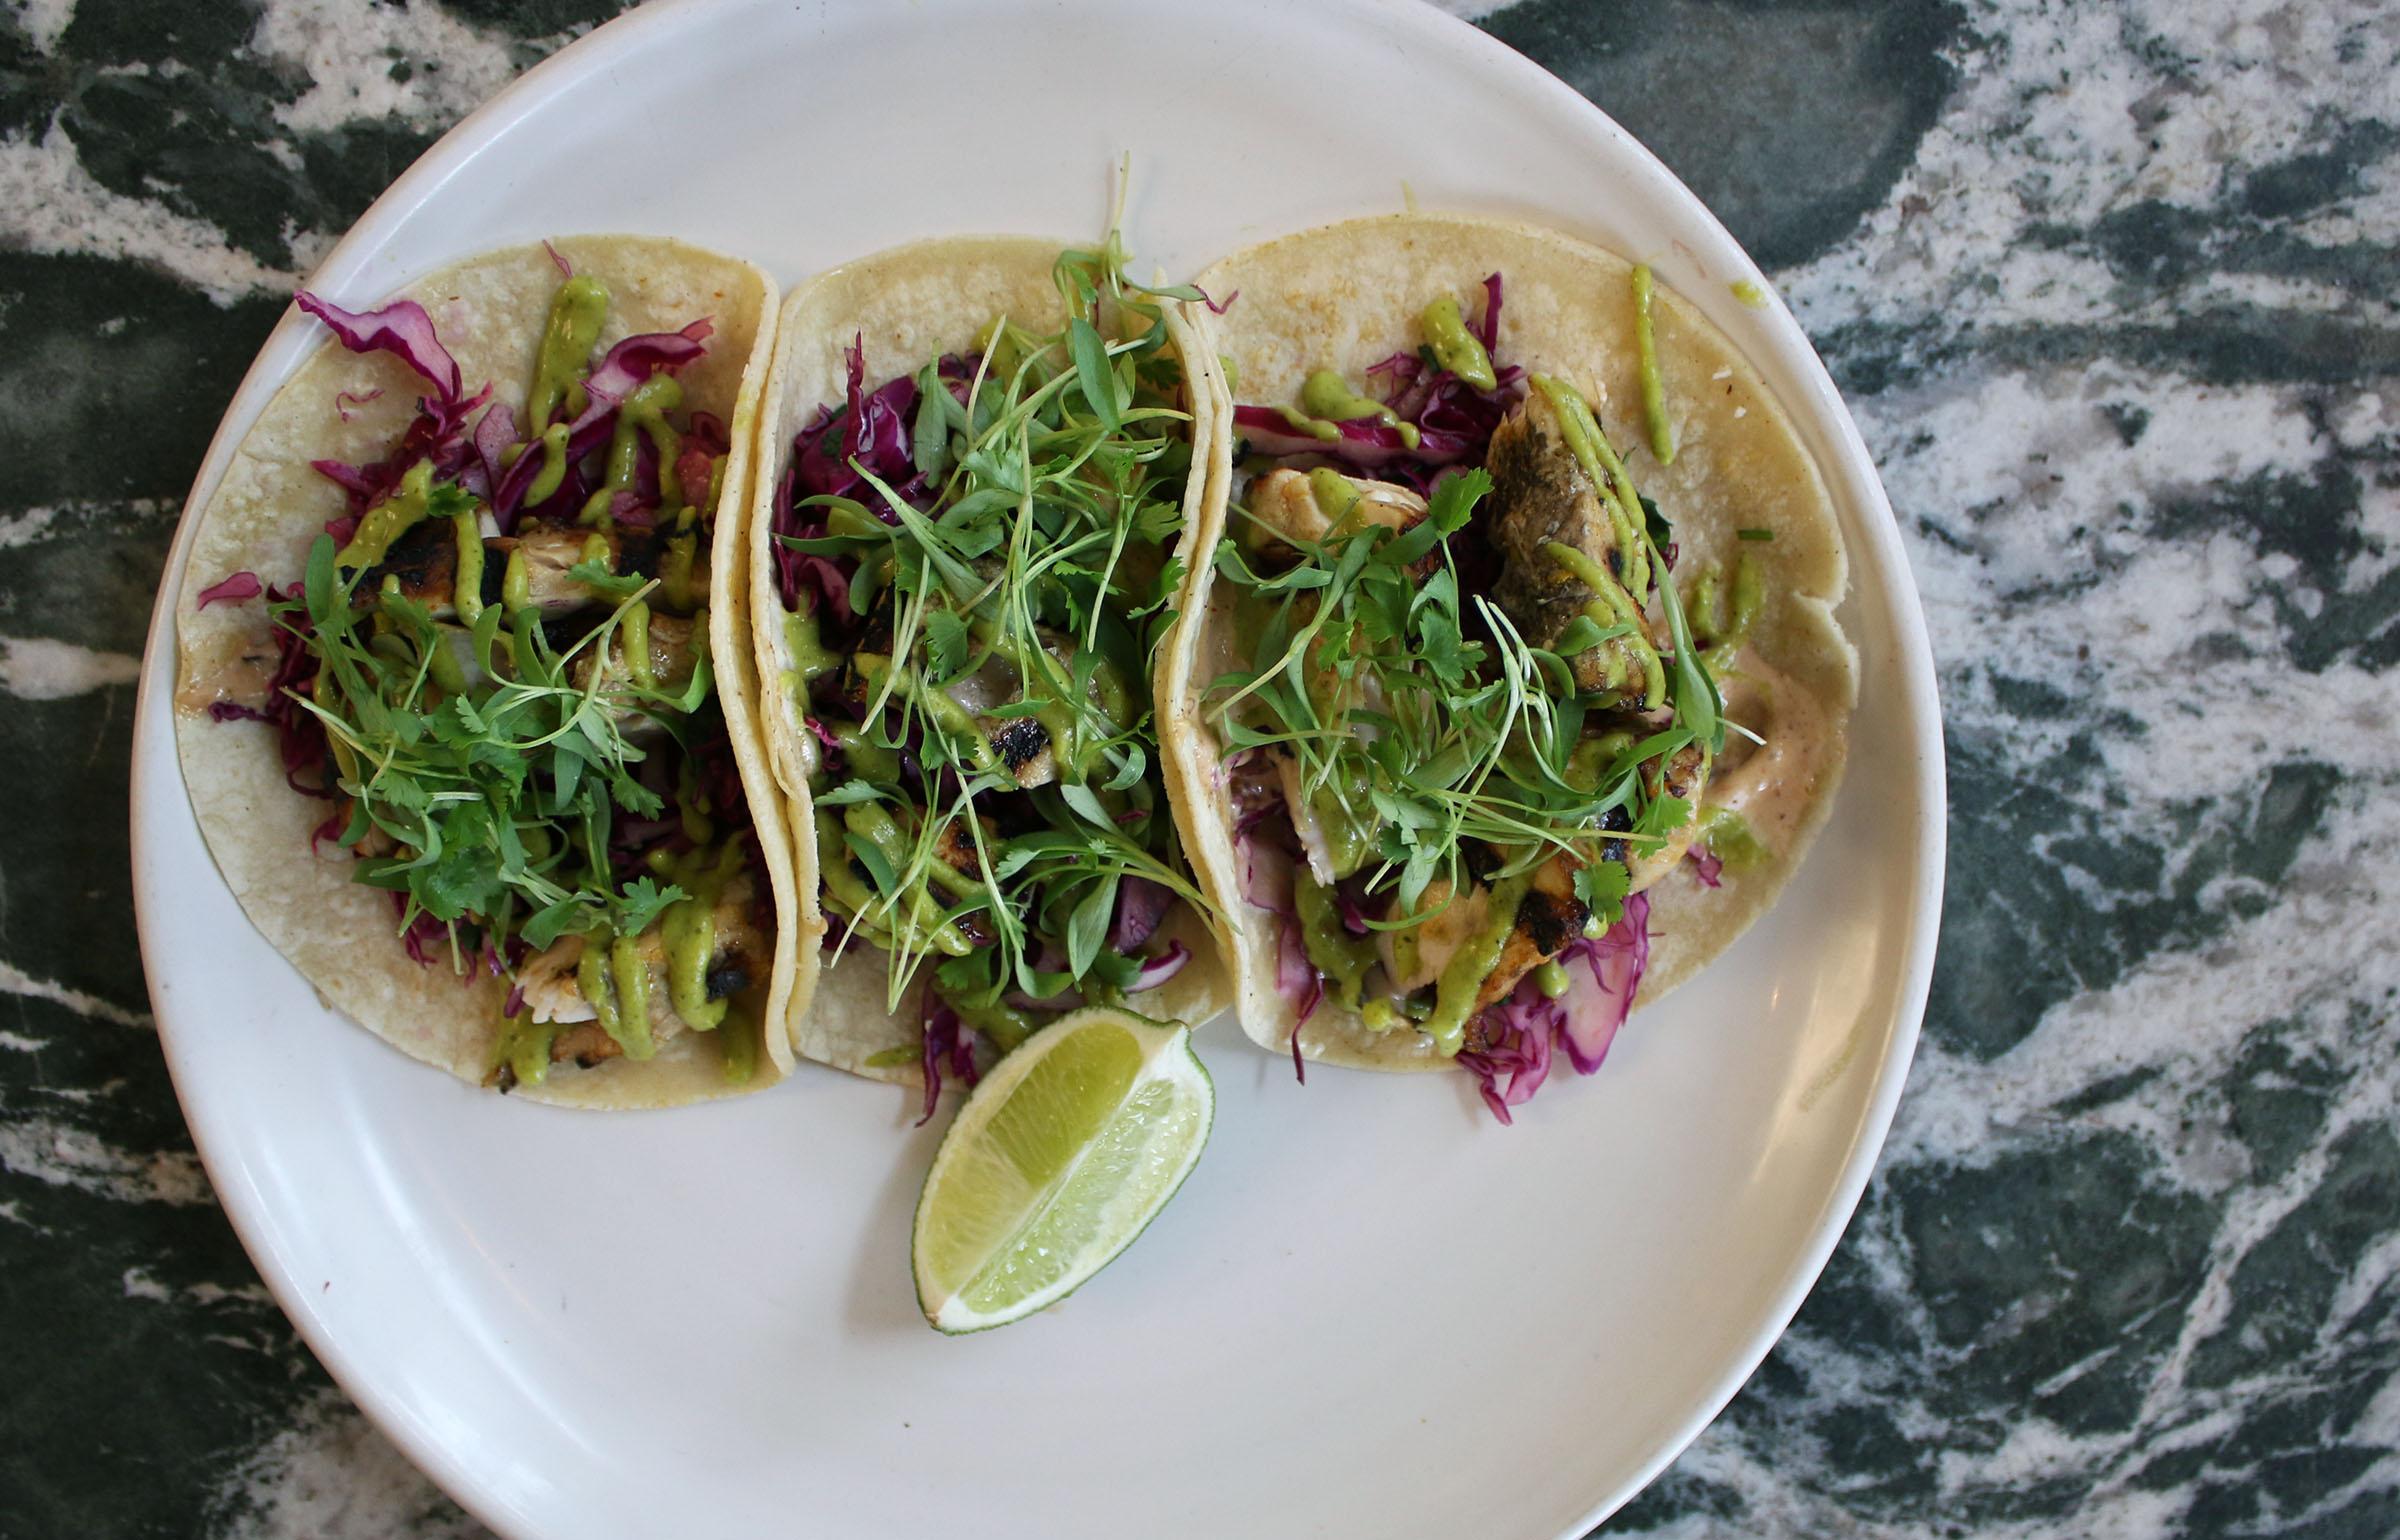 Fish tacos: Grilled fish, citrus slaw, chipotle aioli, mango herb sauce, corn tortillas (gf)